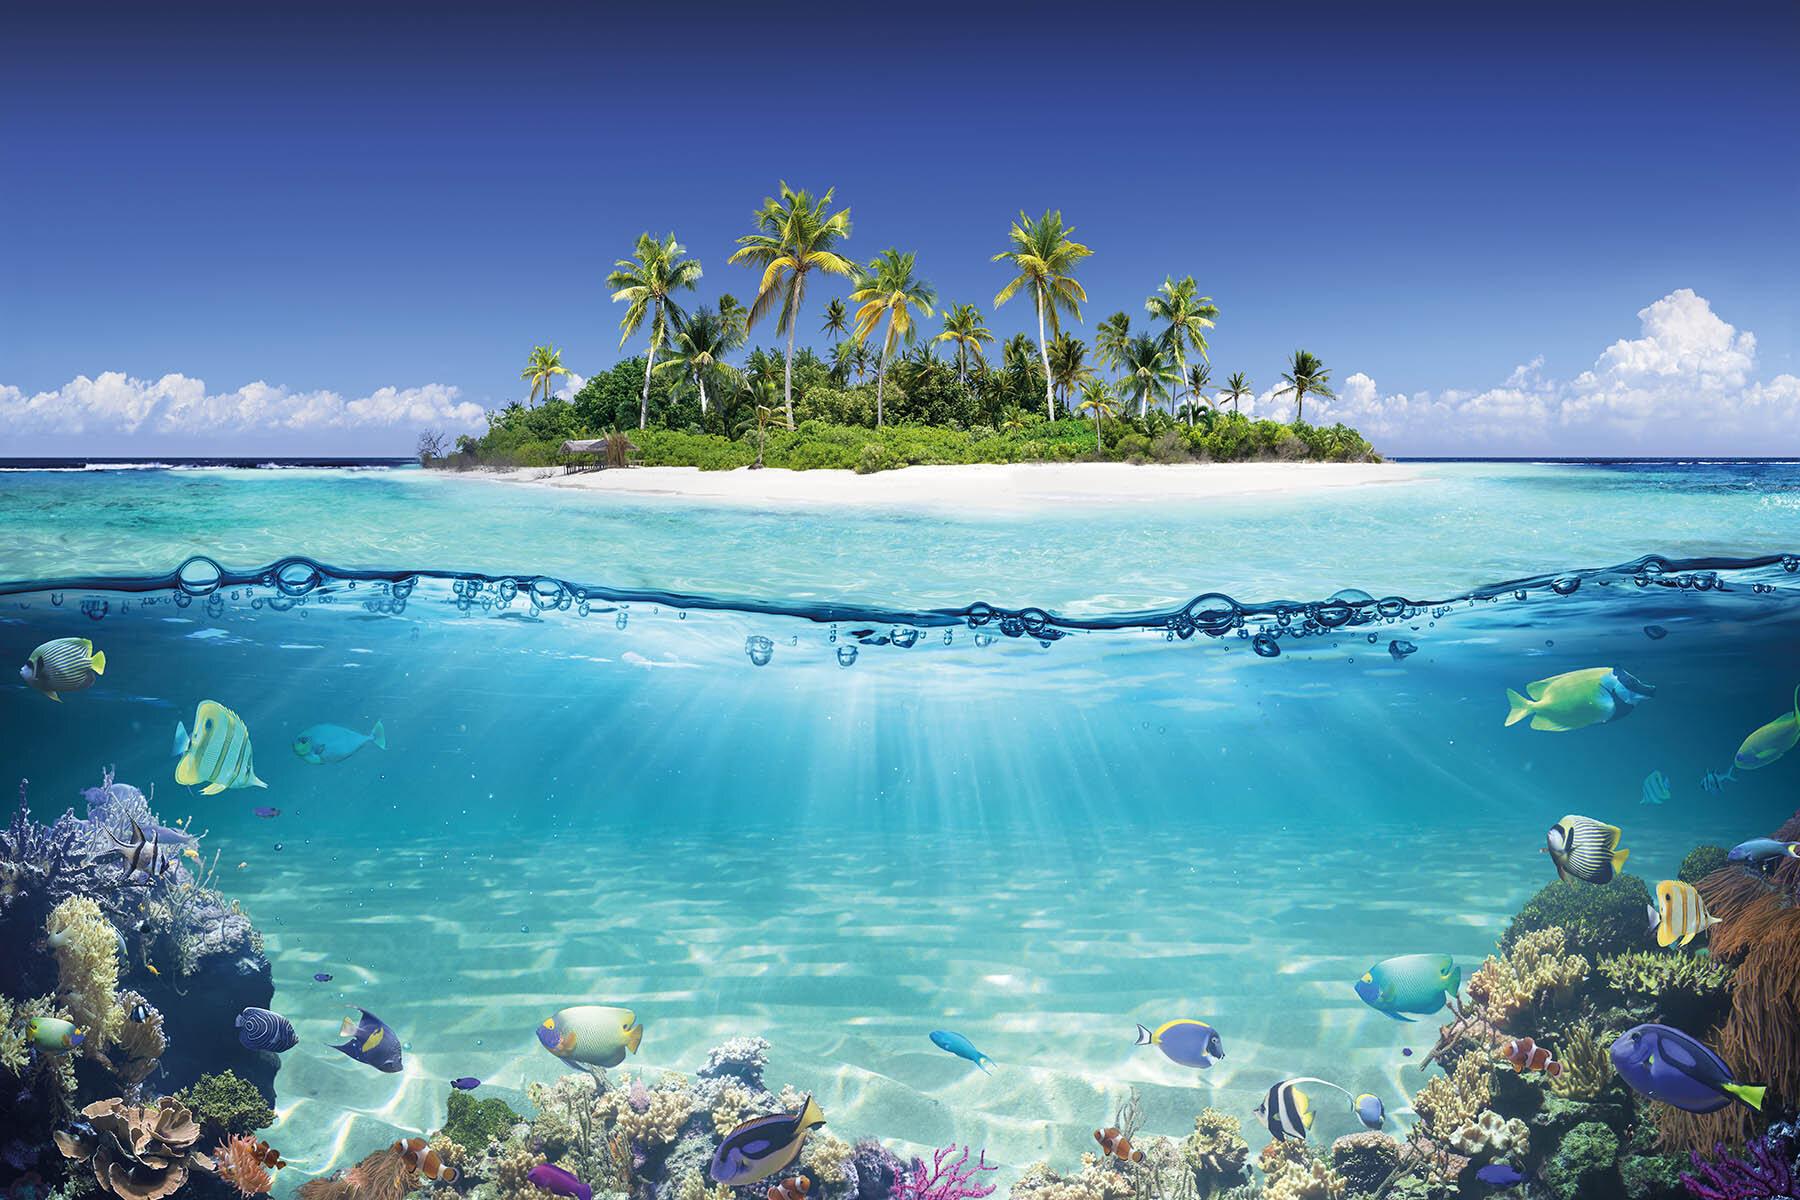 PlateART Duschrückwand mit Motiv Unterwasser Insel